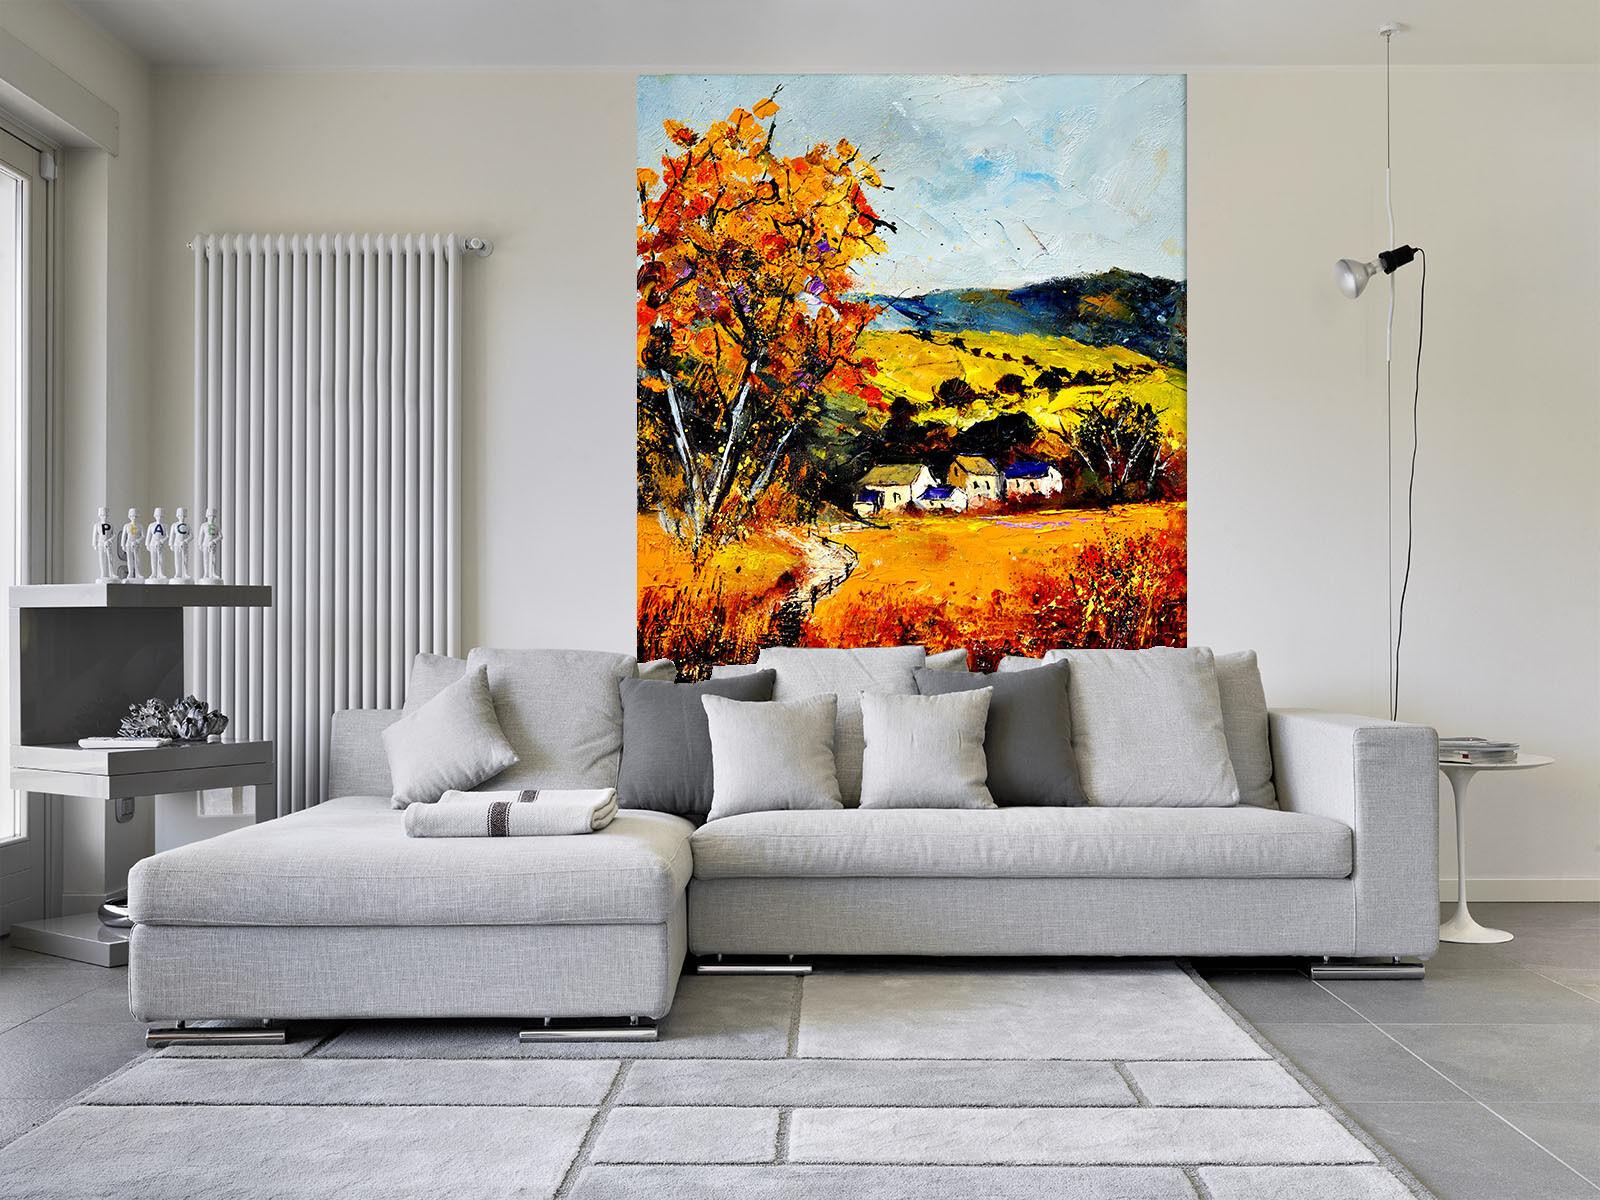 3D Painte giallo Field 04 Wall Paper Wall Print Print Print Decal Wall AJ WALLPAPER CA b86c8e